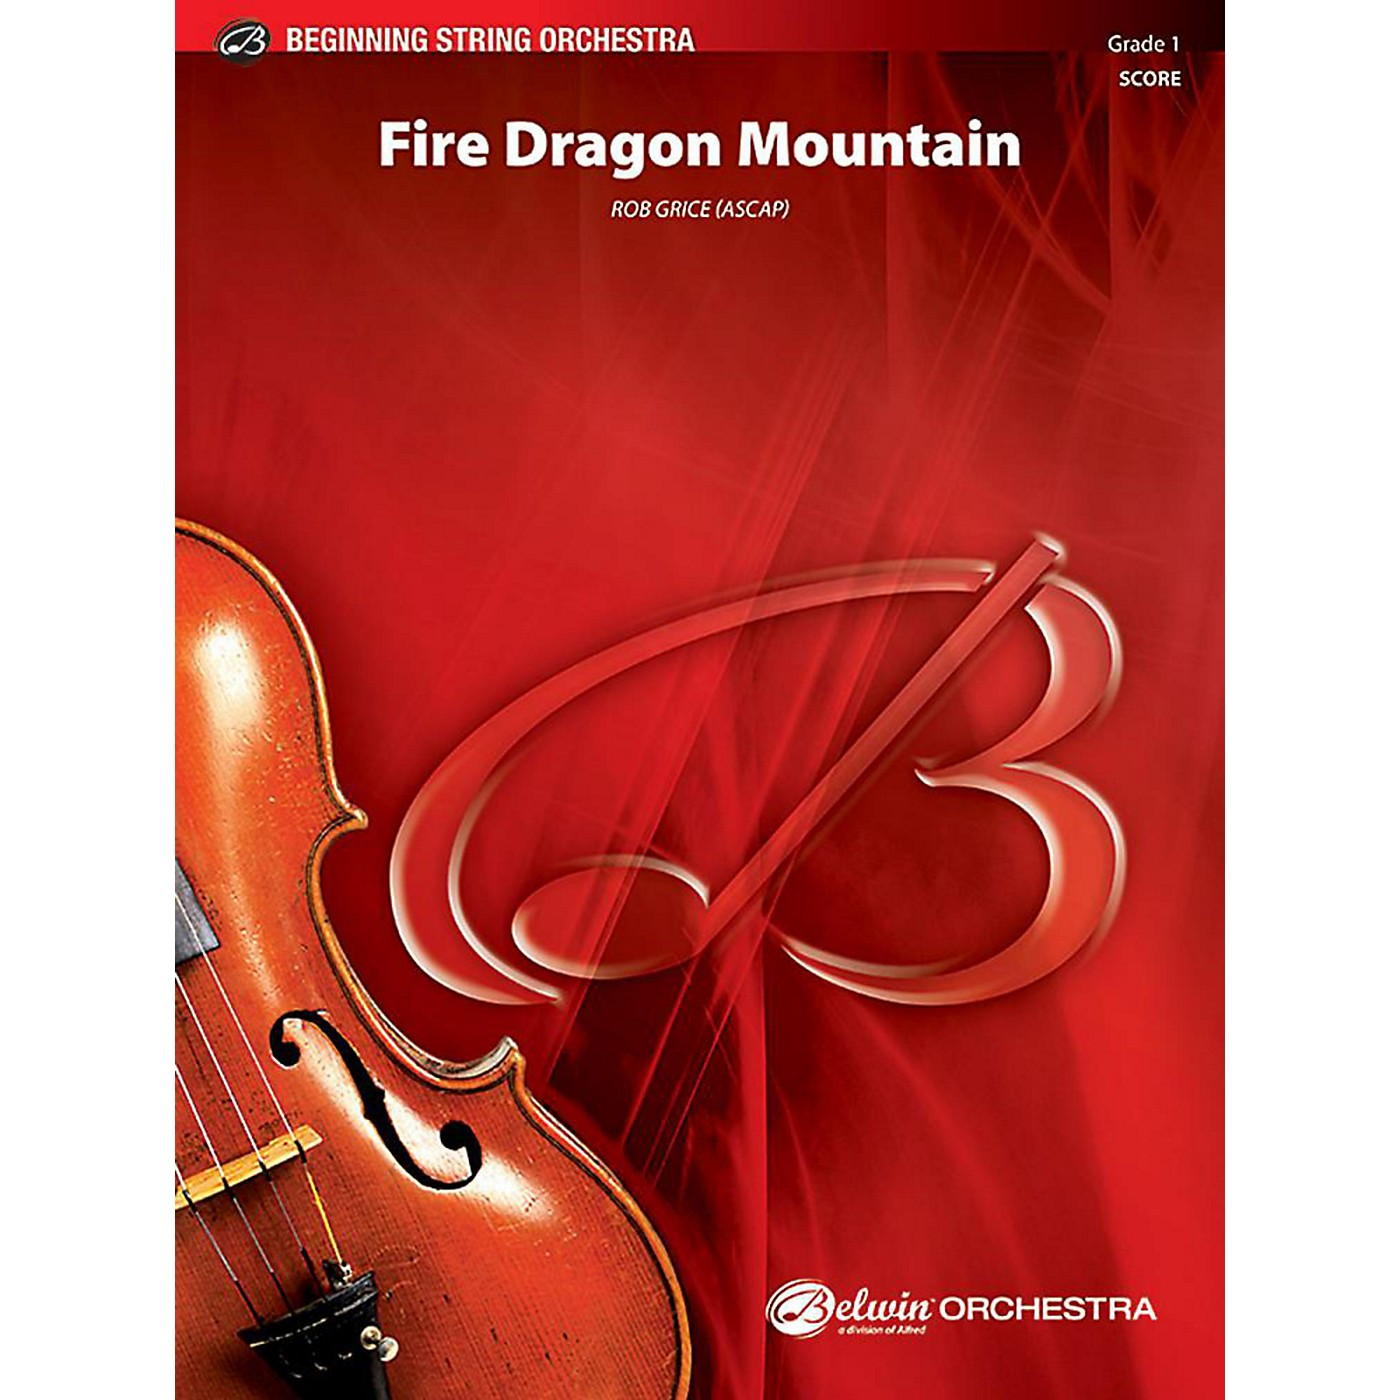 Alfred Fire Dragon Mountain String Orchestra Grade 1 Set thumbnail